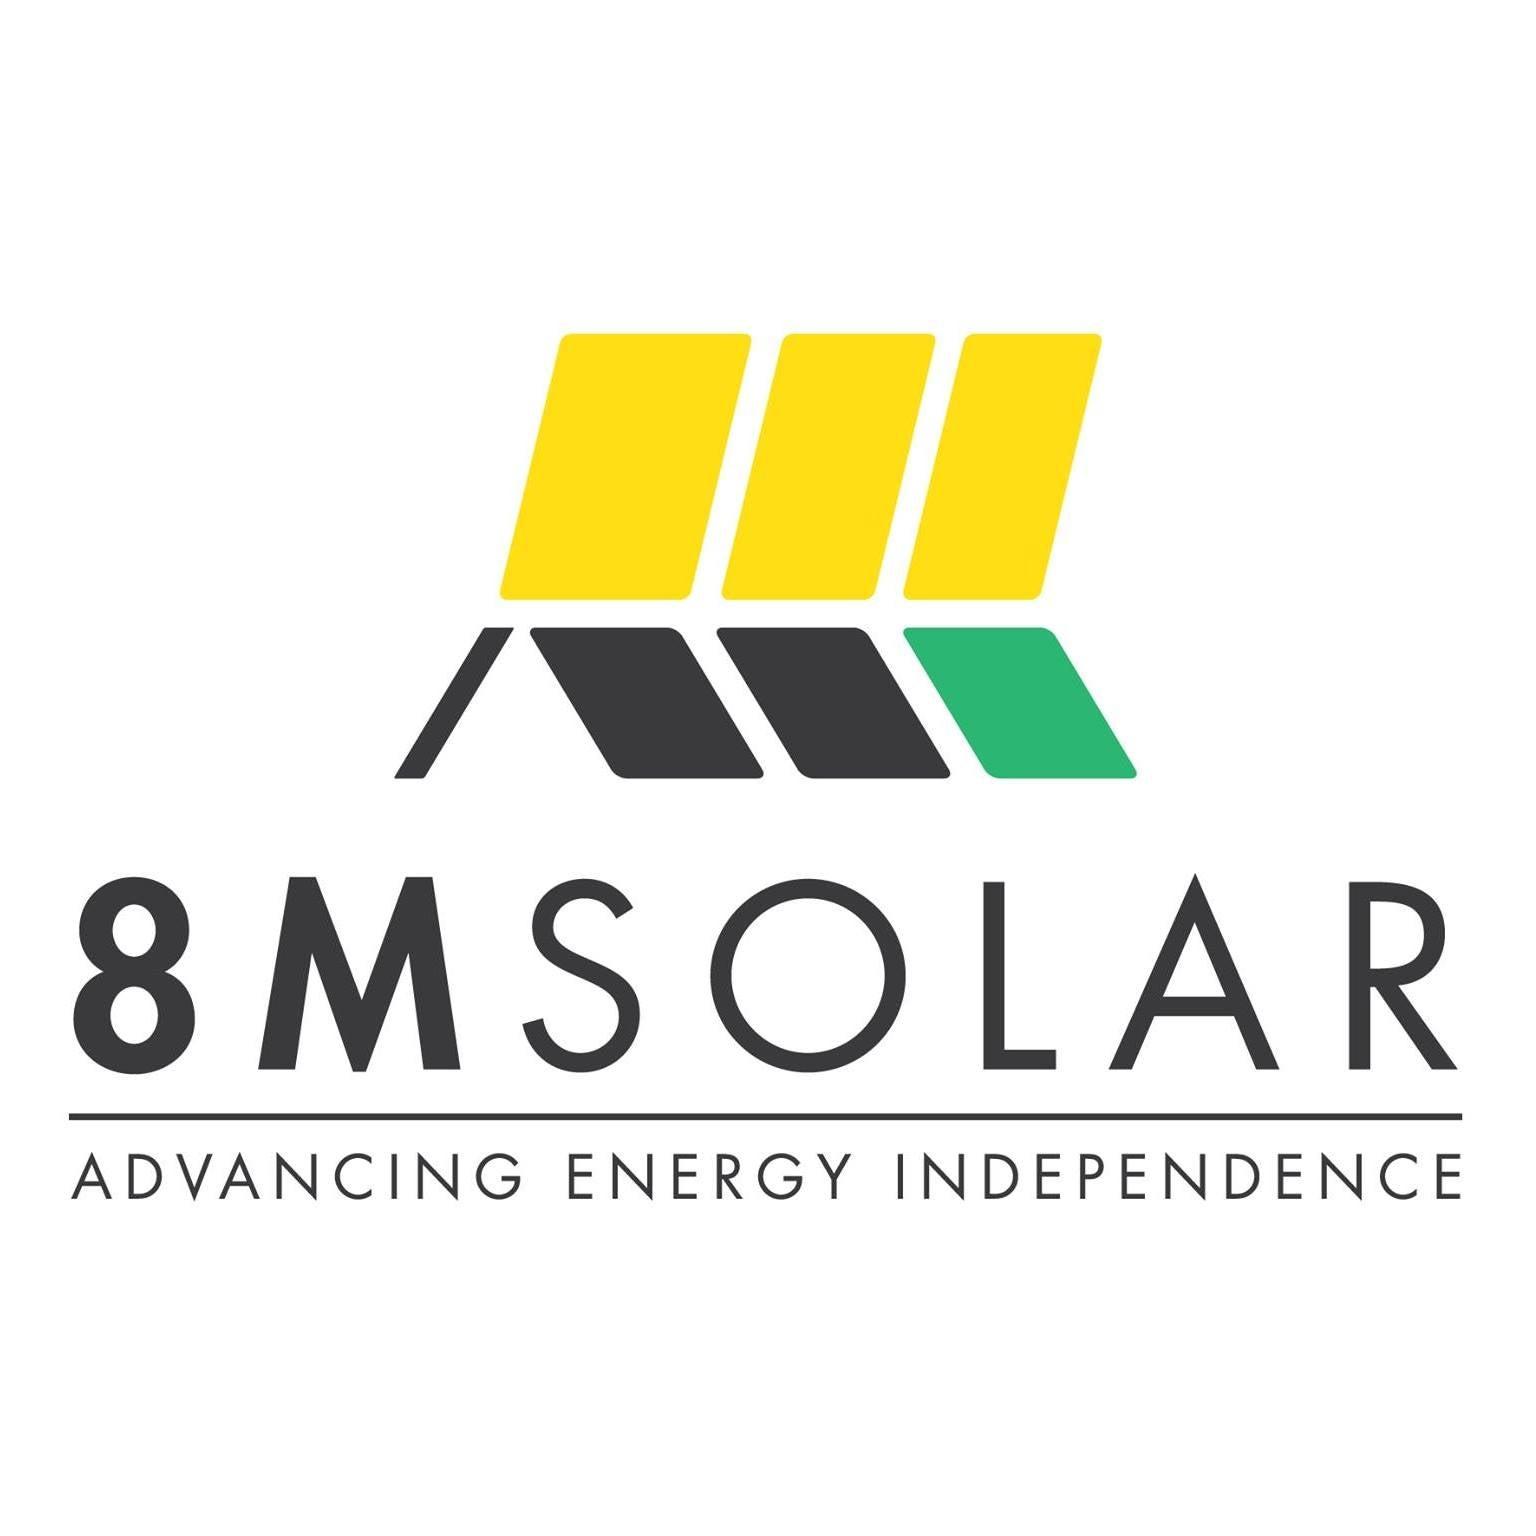 8MSolar logo